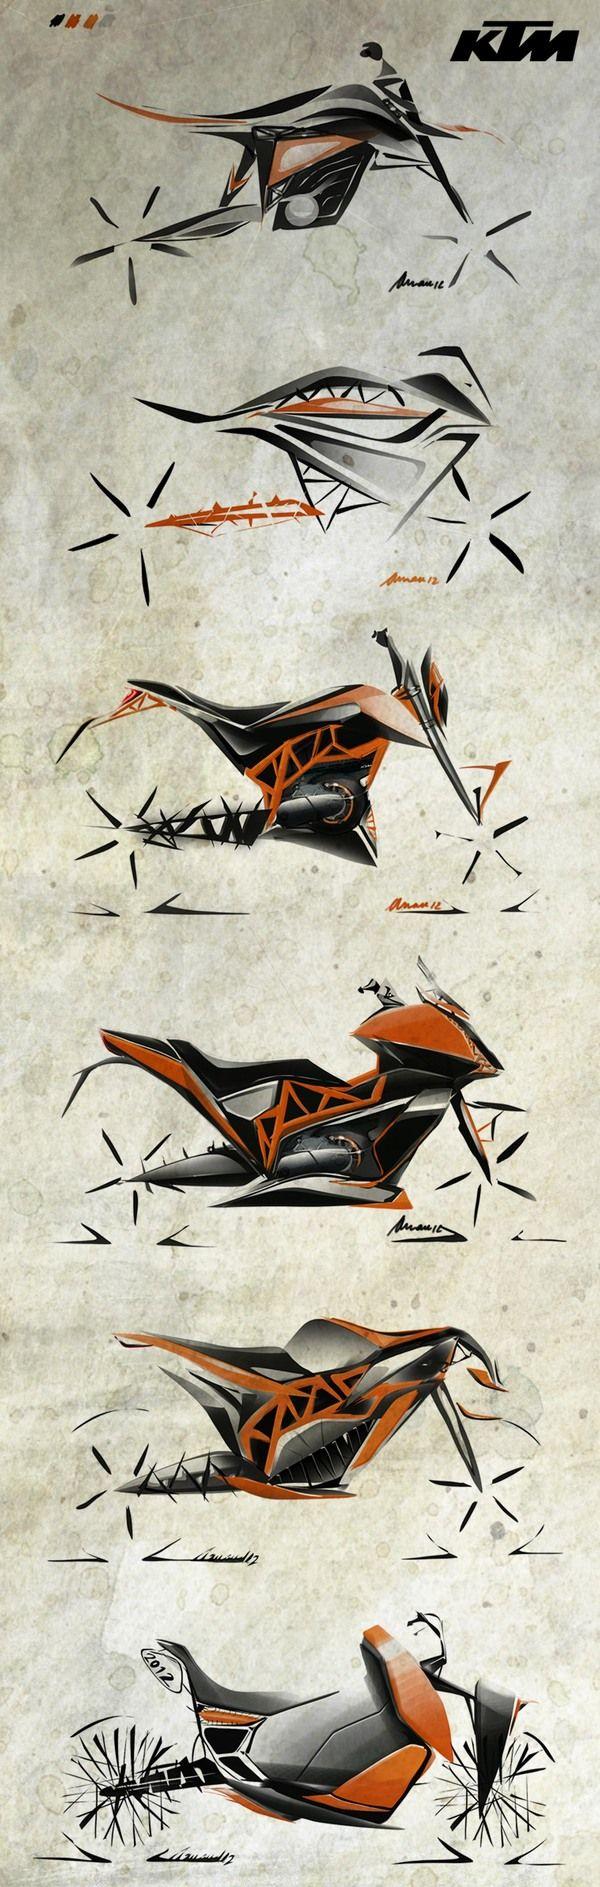 Motorcycle design by Arnau Sanjuan Roman, via Behance